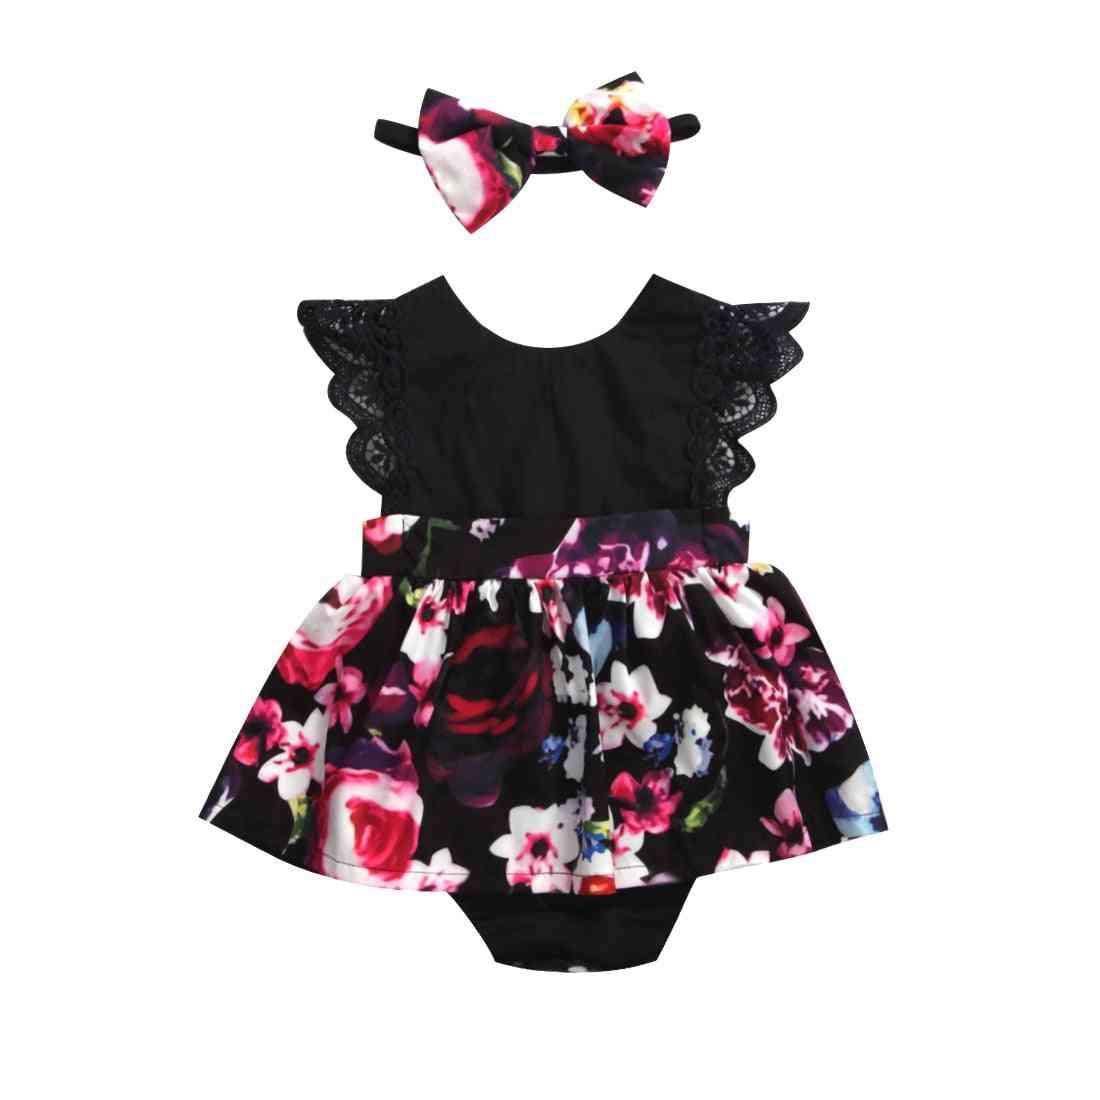 Newborn Baby Girl Romper Tutu Dress Headband Floral Outfits Party Dress